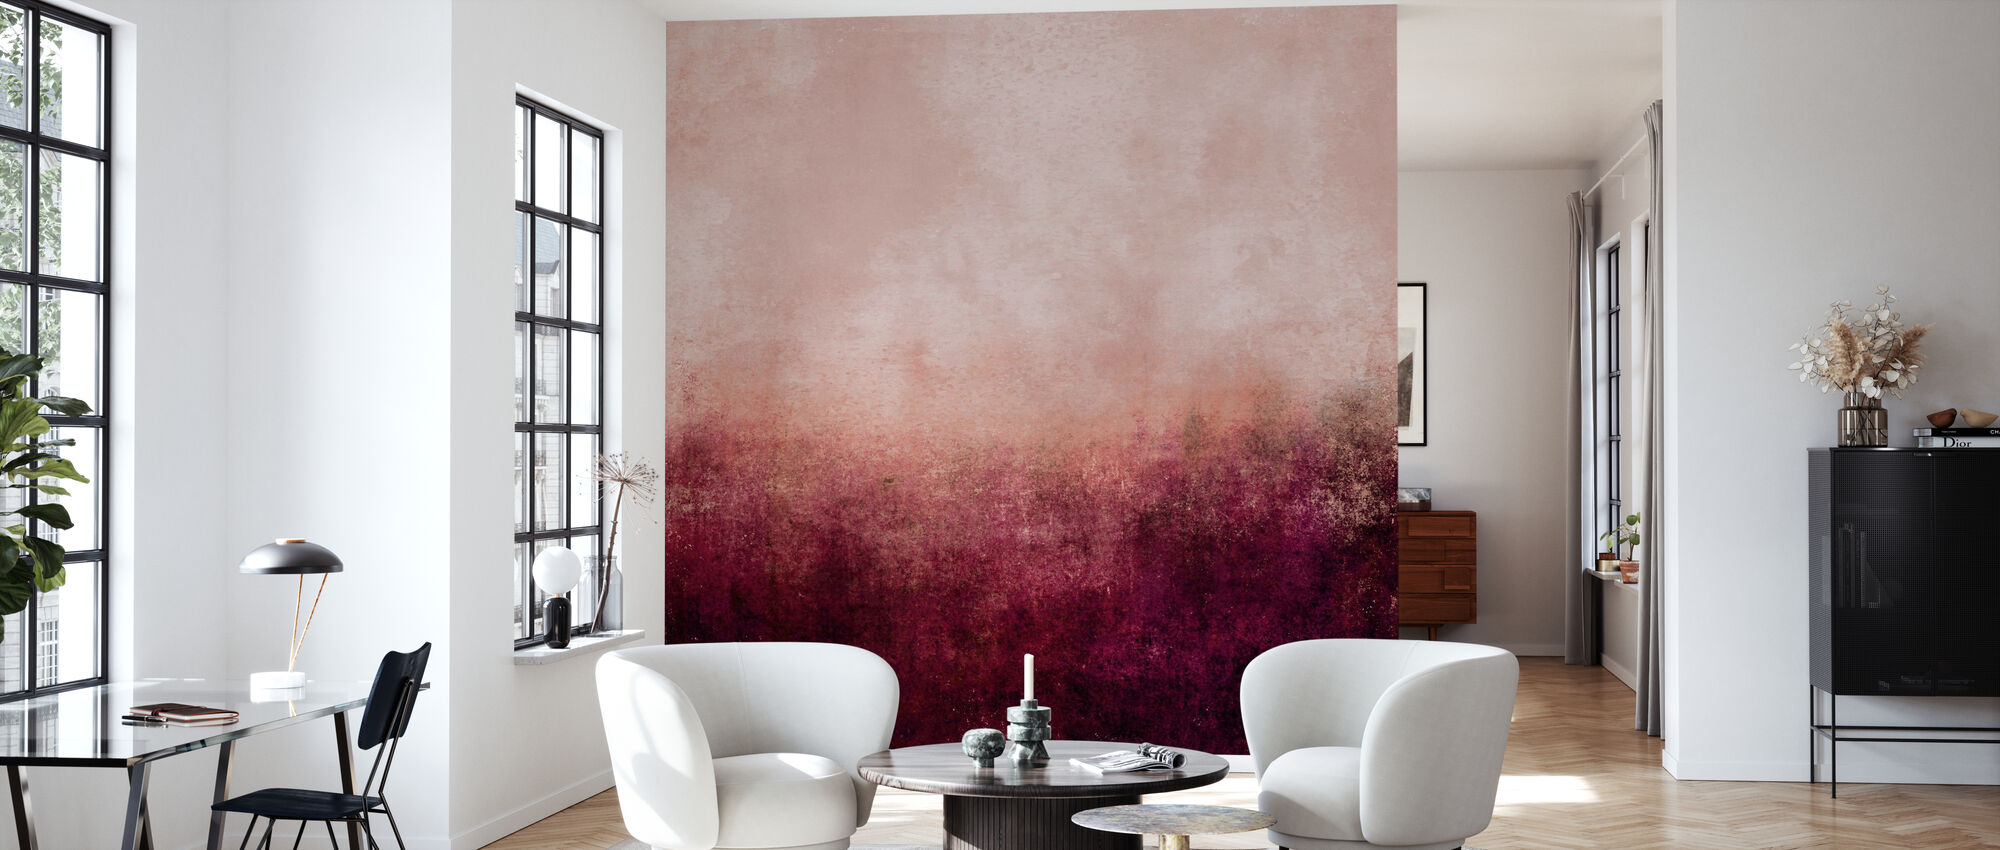 Life In Pink - Wallpaper - Living Room